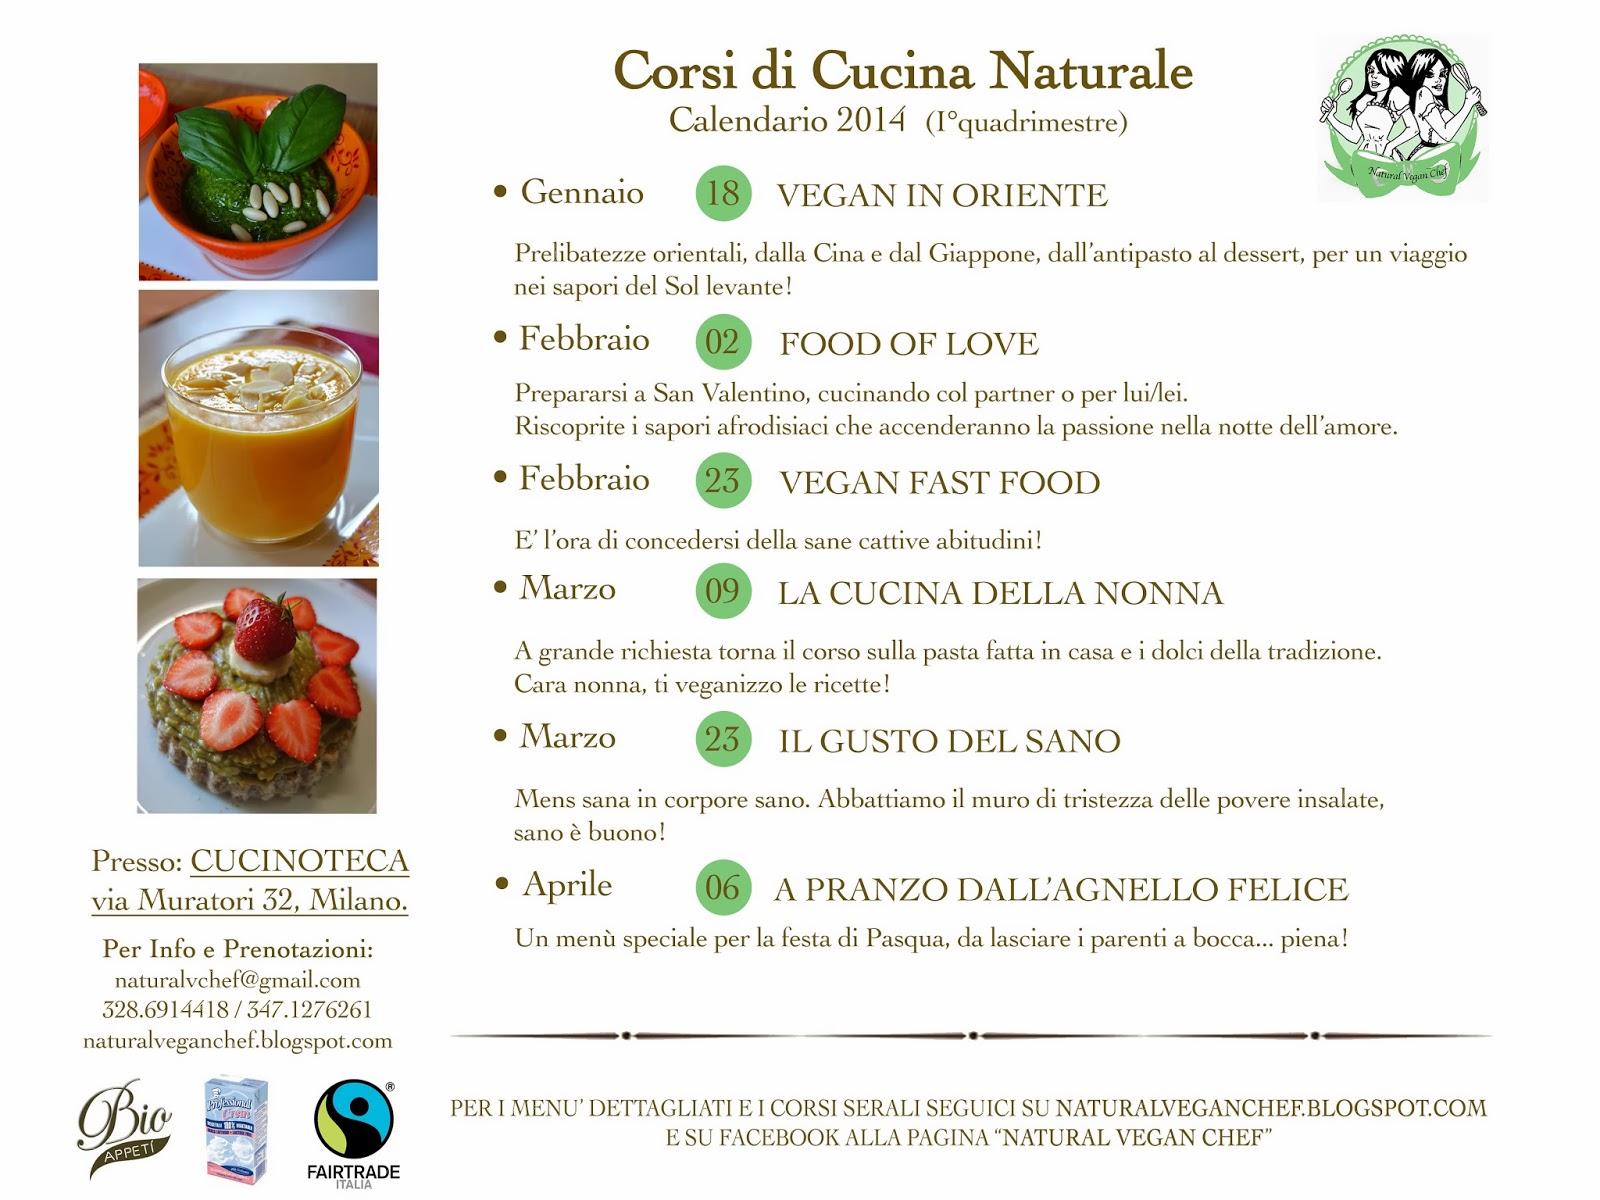 Nuovi Corsi di Cucina Naturale 2014  Natural Vegan Chef